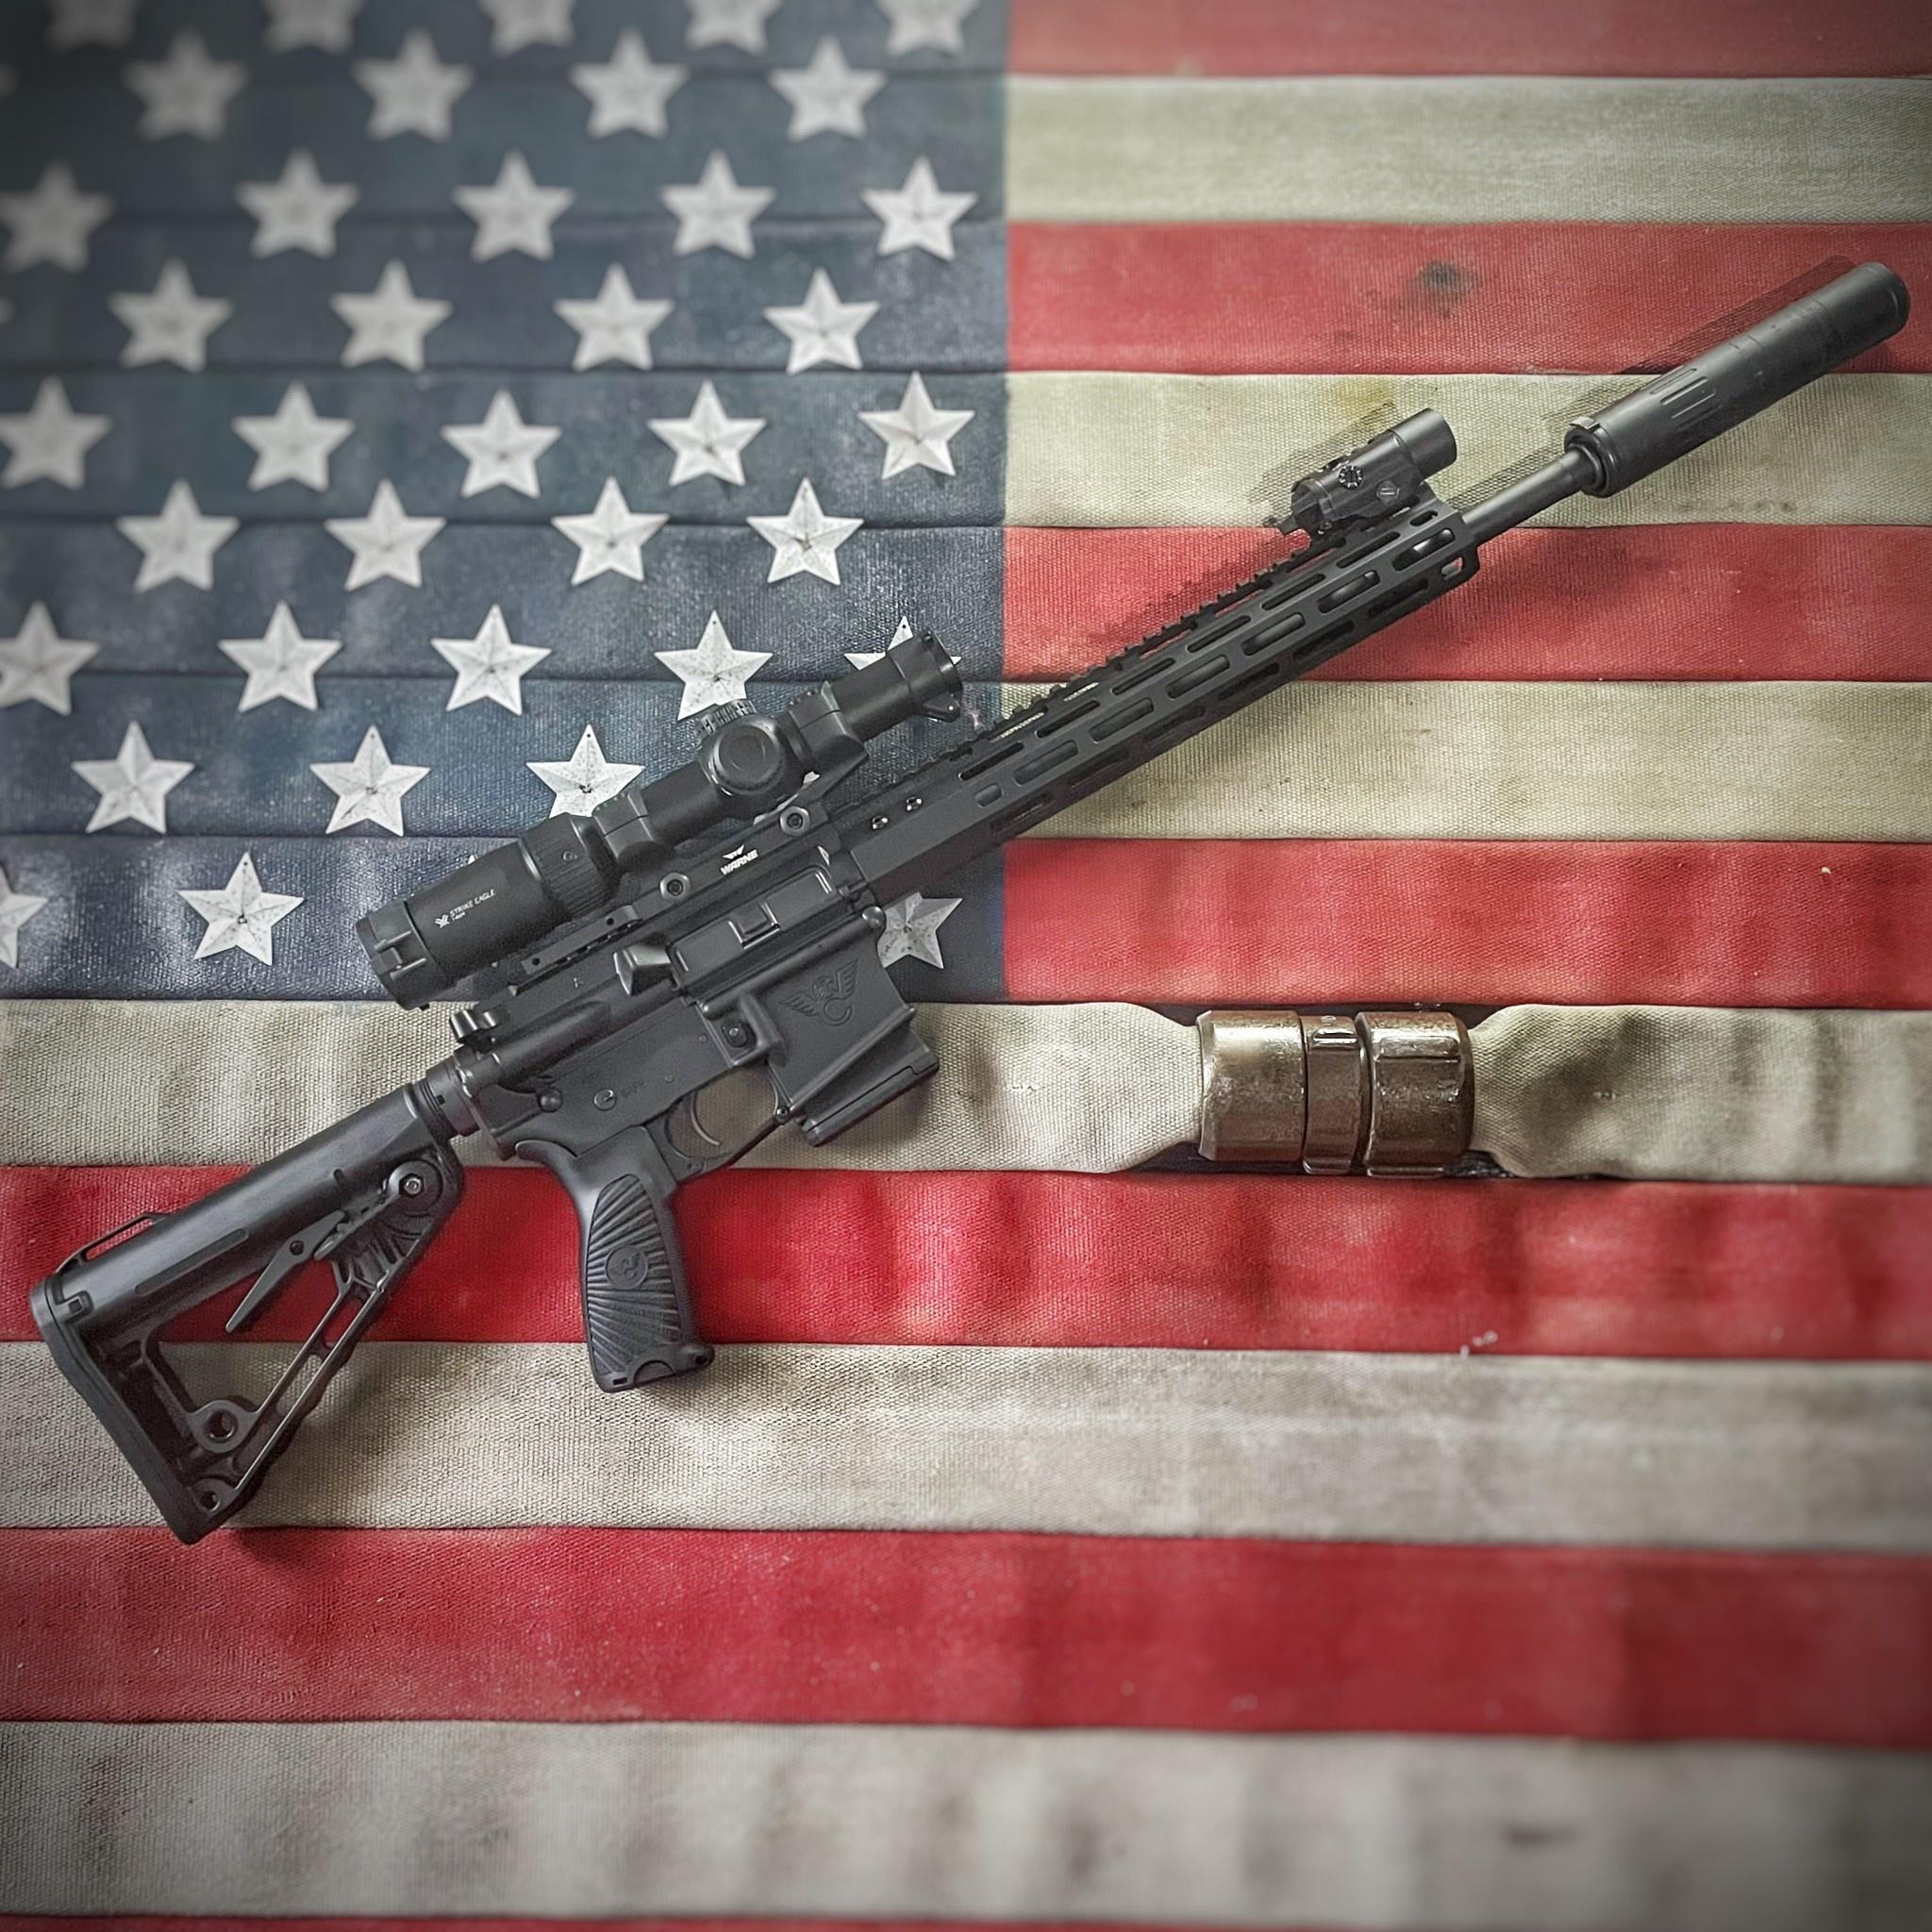 08/05 - AR-15 Rifle maintenance class  - 6 to 7pm